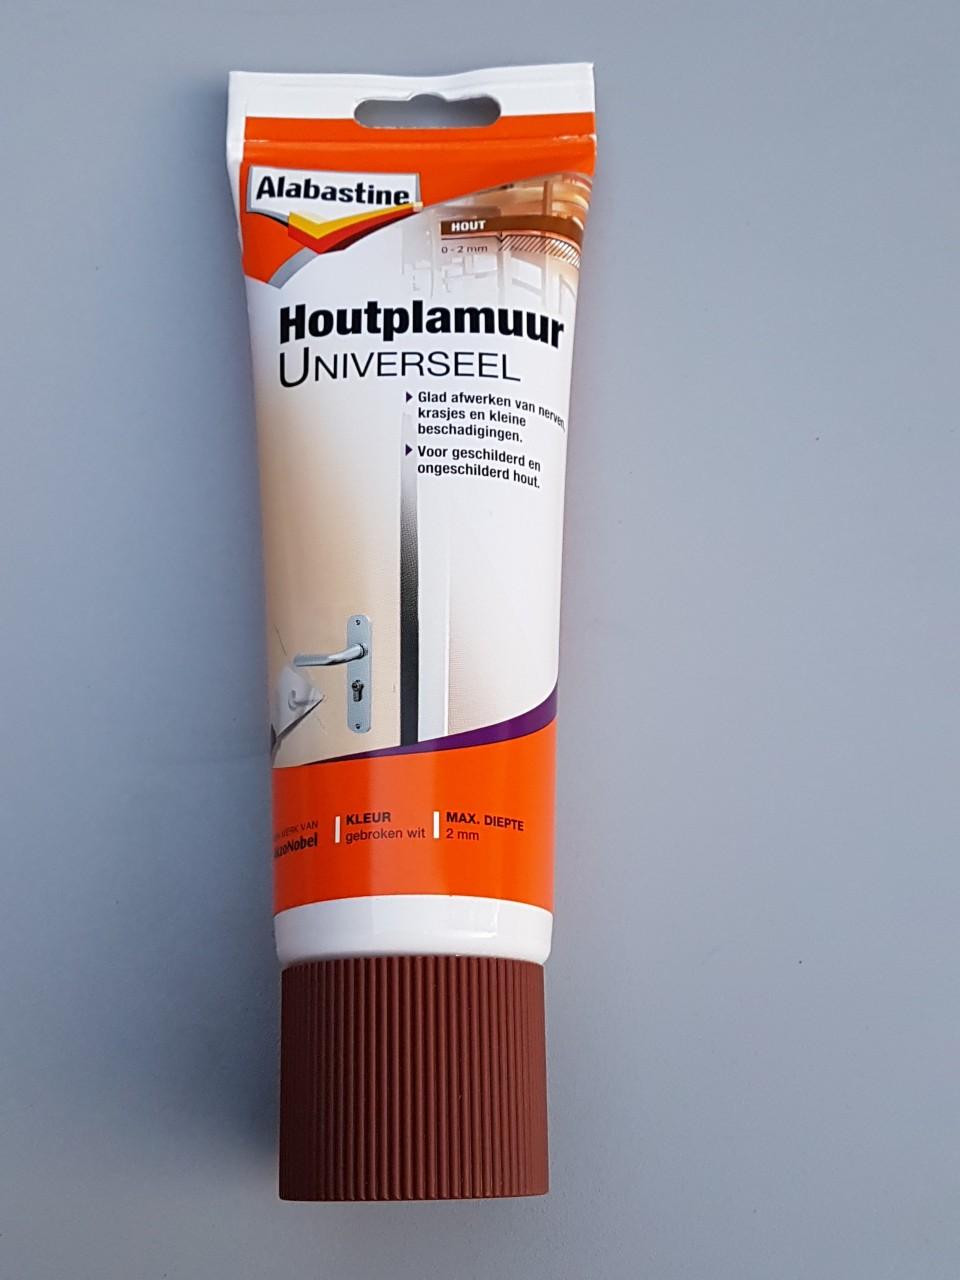 Alabastine houtplamuur